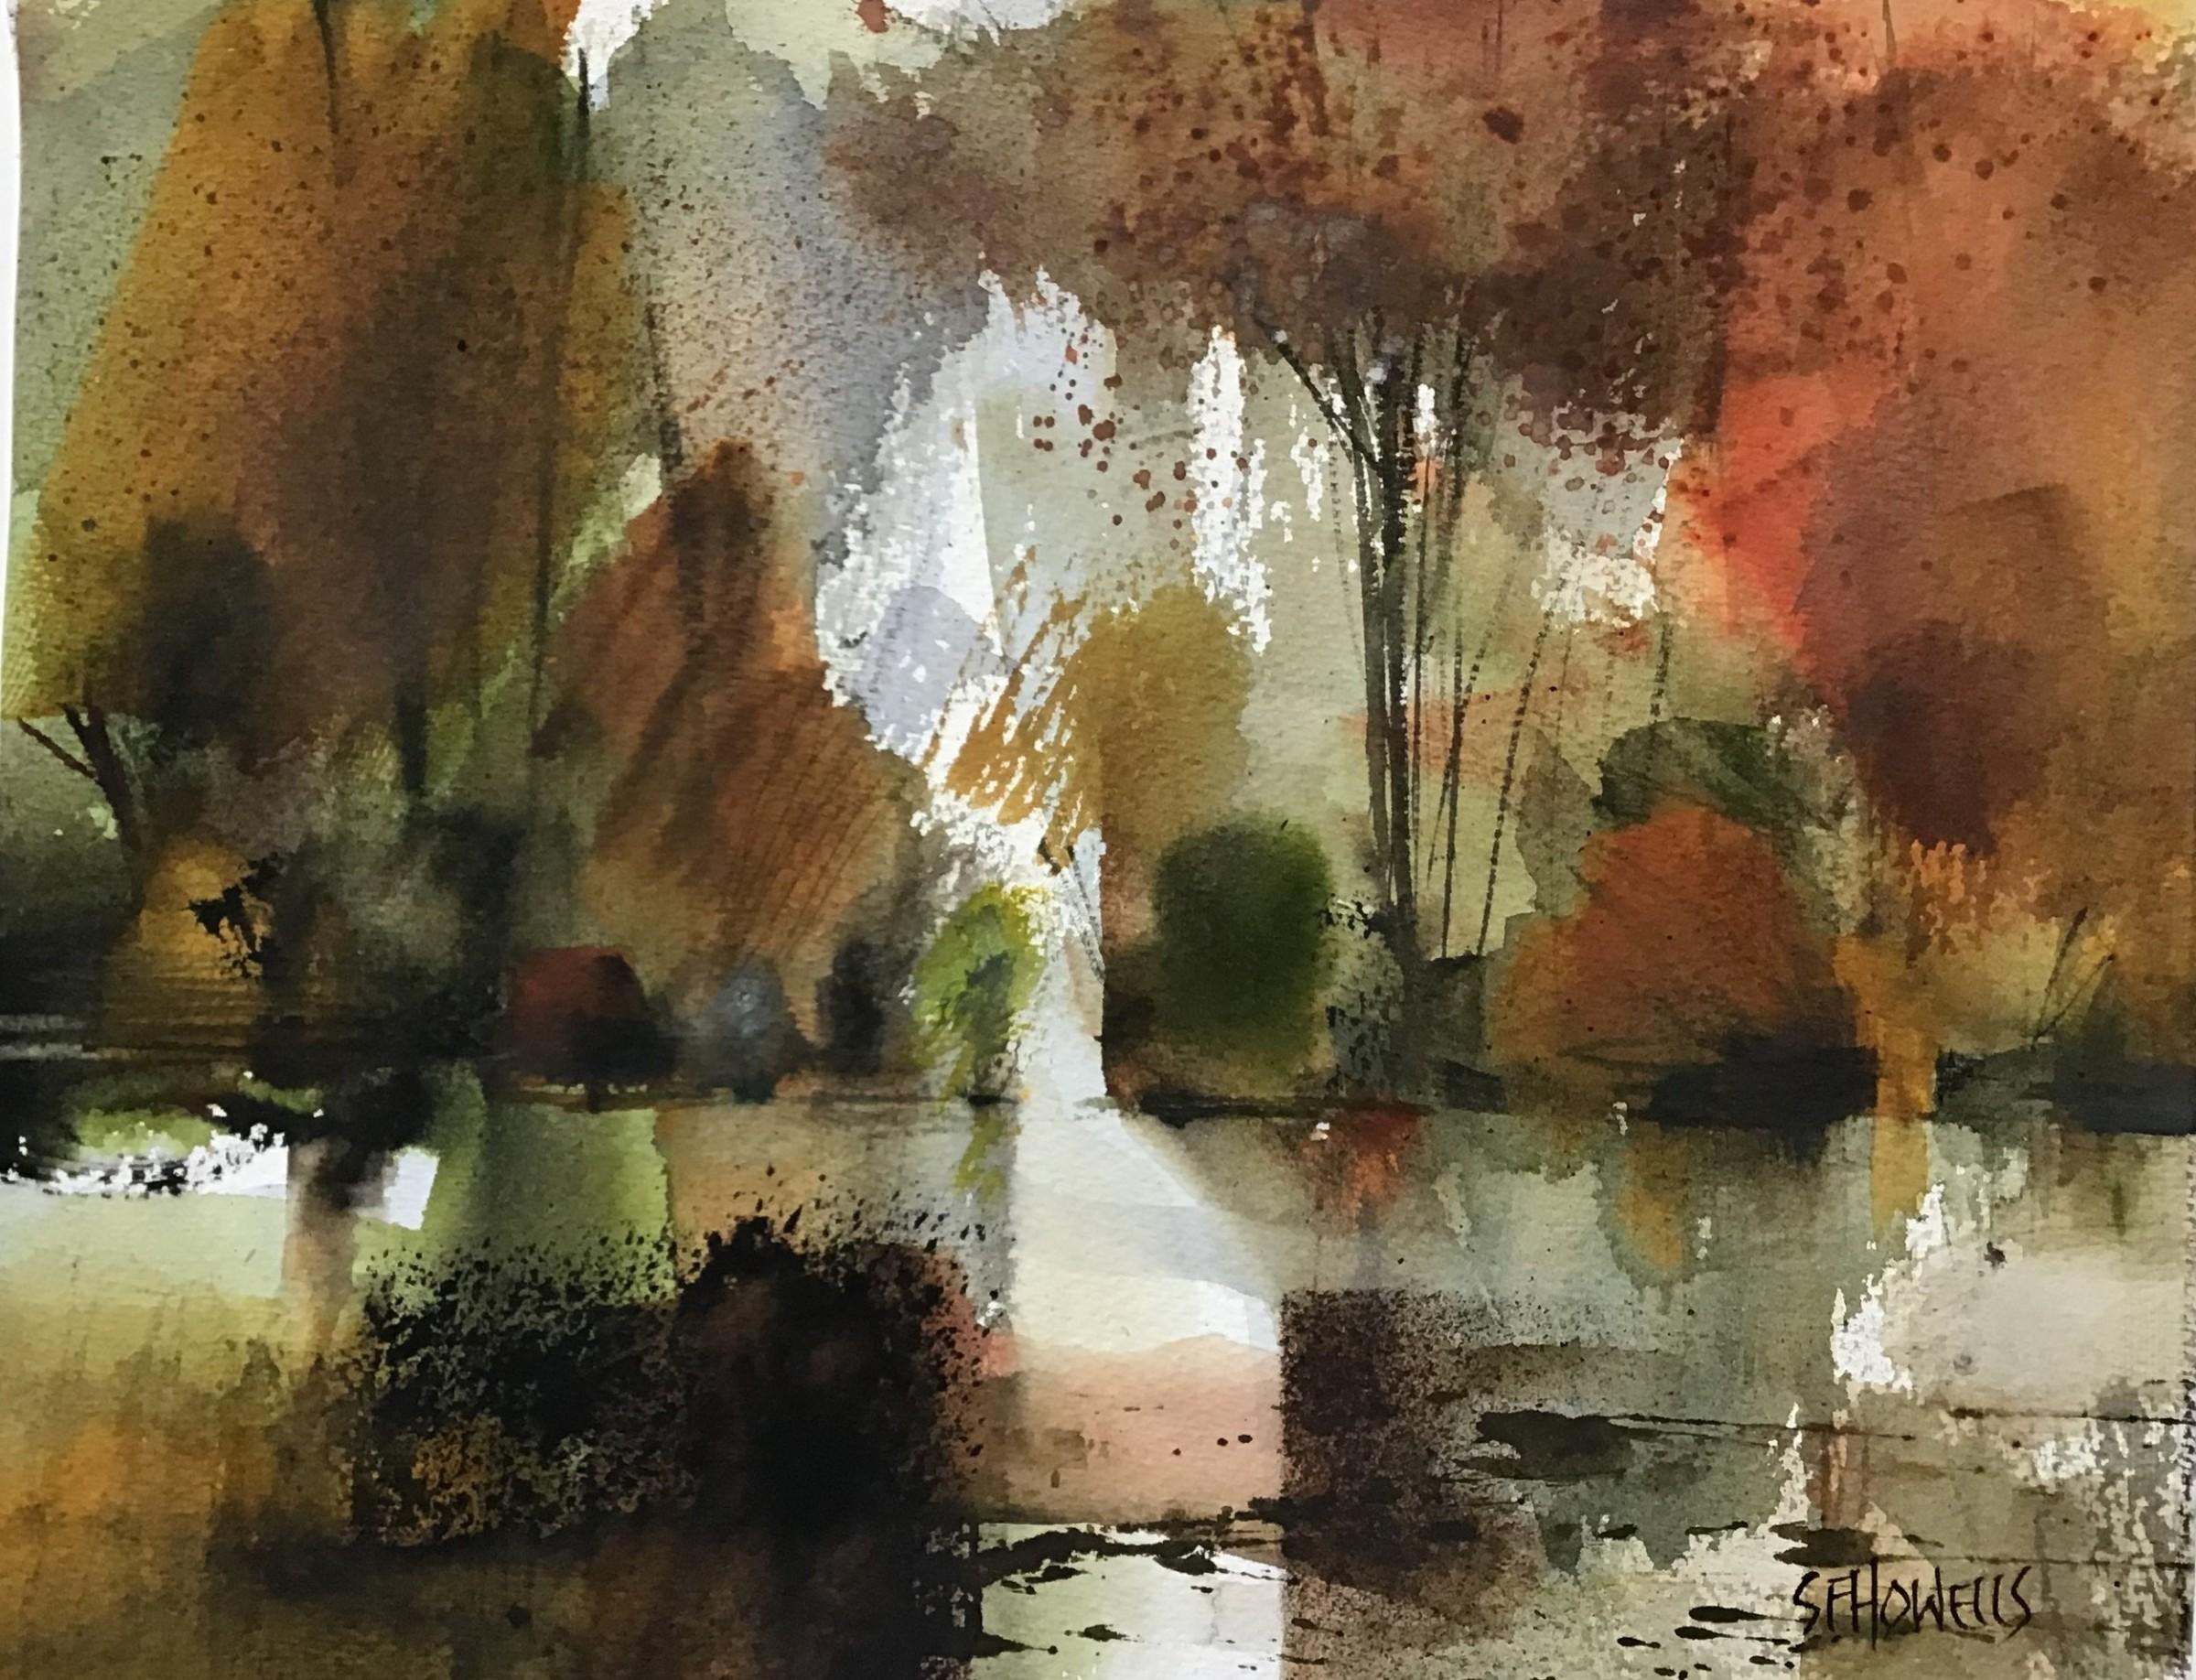 "<span class=""link fancybox-details-link""><a href=""/artists/136-sue-howells/works/12234-sue-howells-autumn-springs-eternal/"">View Detail Page</a></span><div class=""artist""><span class=""artist""><strong>Sue Howells</strong></span></div><div class=""title""><em>Autumn Springs Eternal</em></div><div class=""medium"">watercolour</div><div class=""dimensions"">Frame: 45 x 51 cm<br /> Artwork: 26 x 33 cm</div><div class=""price"">£400.00</div>"